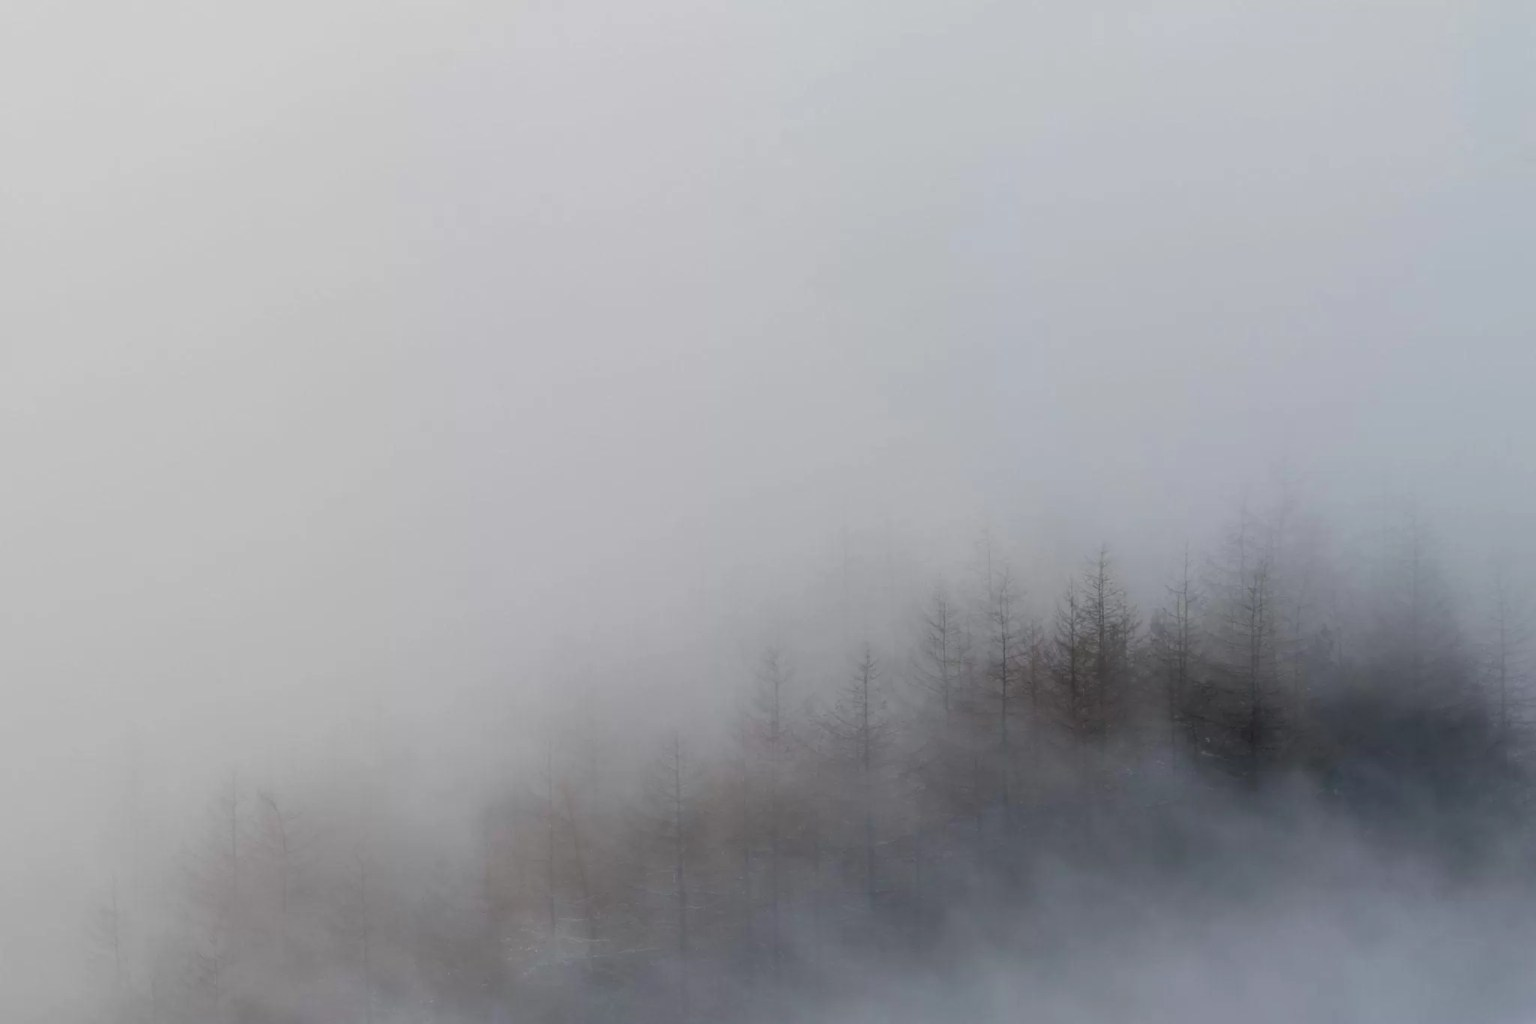 Mam Tor Misty Trees -  Mam Tor Peak District Photography Workshop